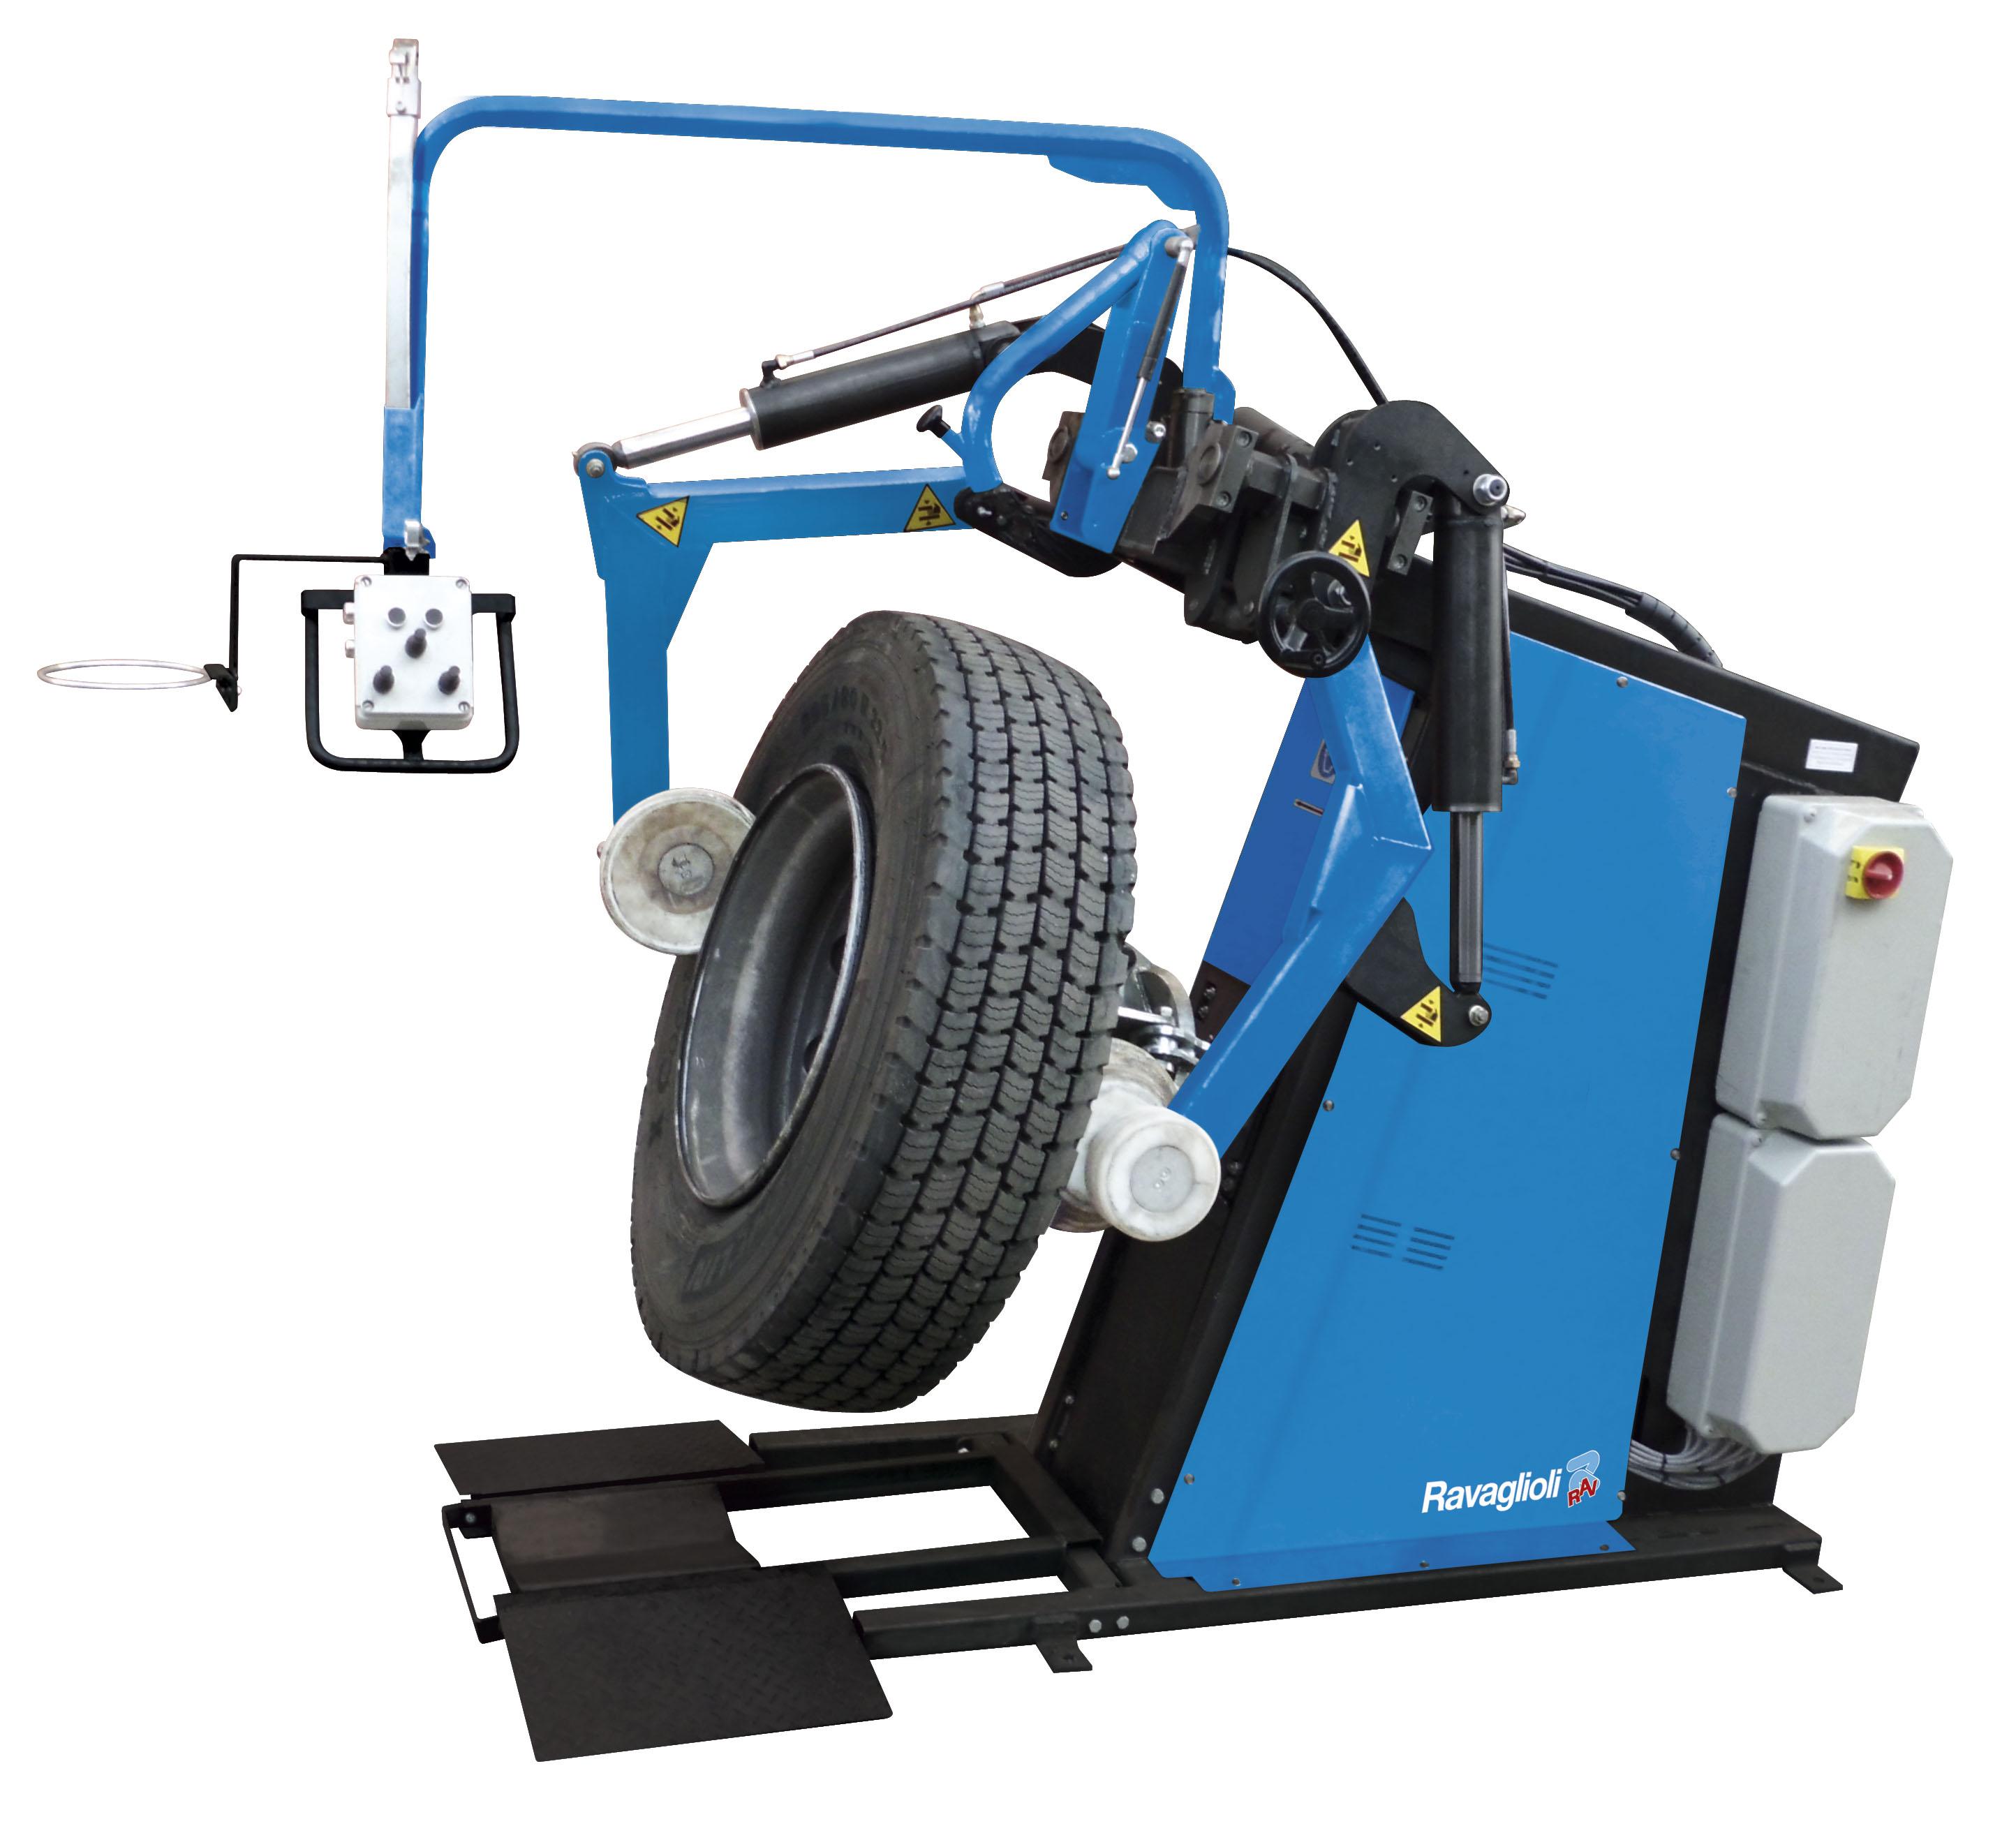 GTB16N Ravaglioli Commercial Tyre Changer